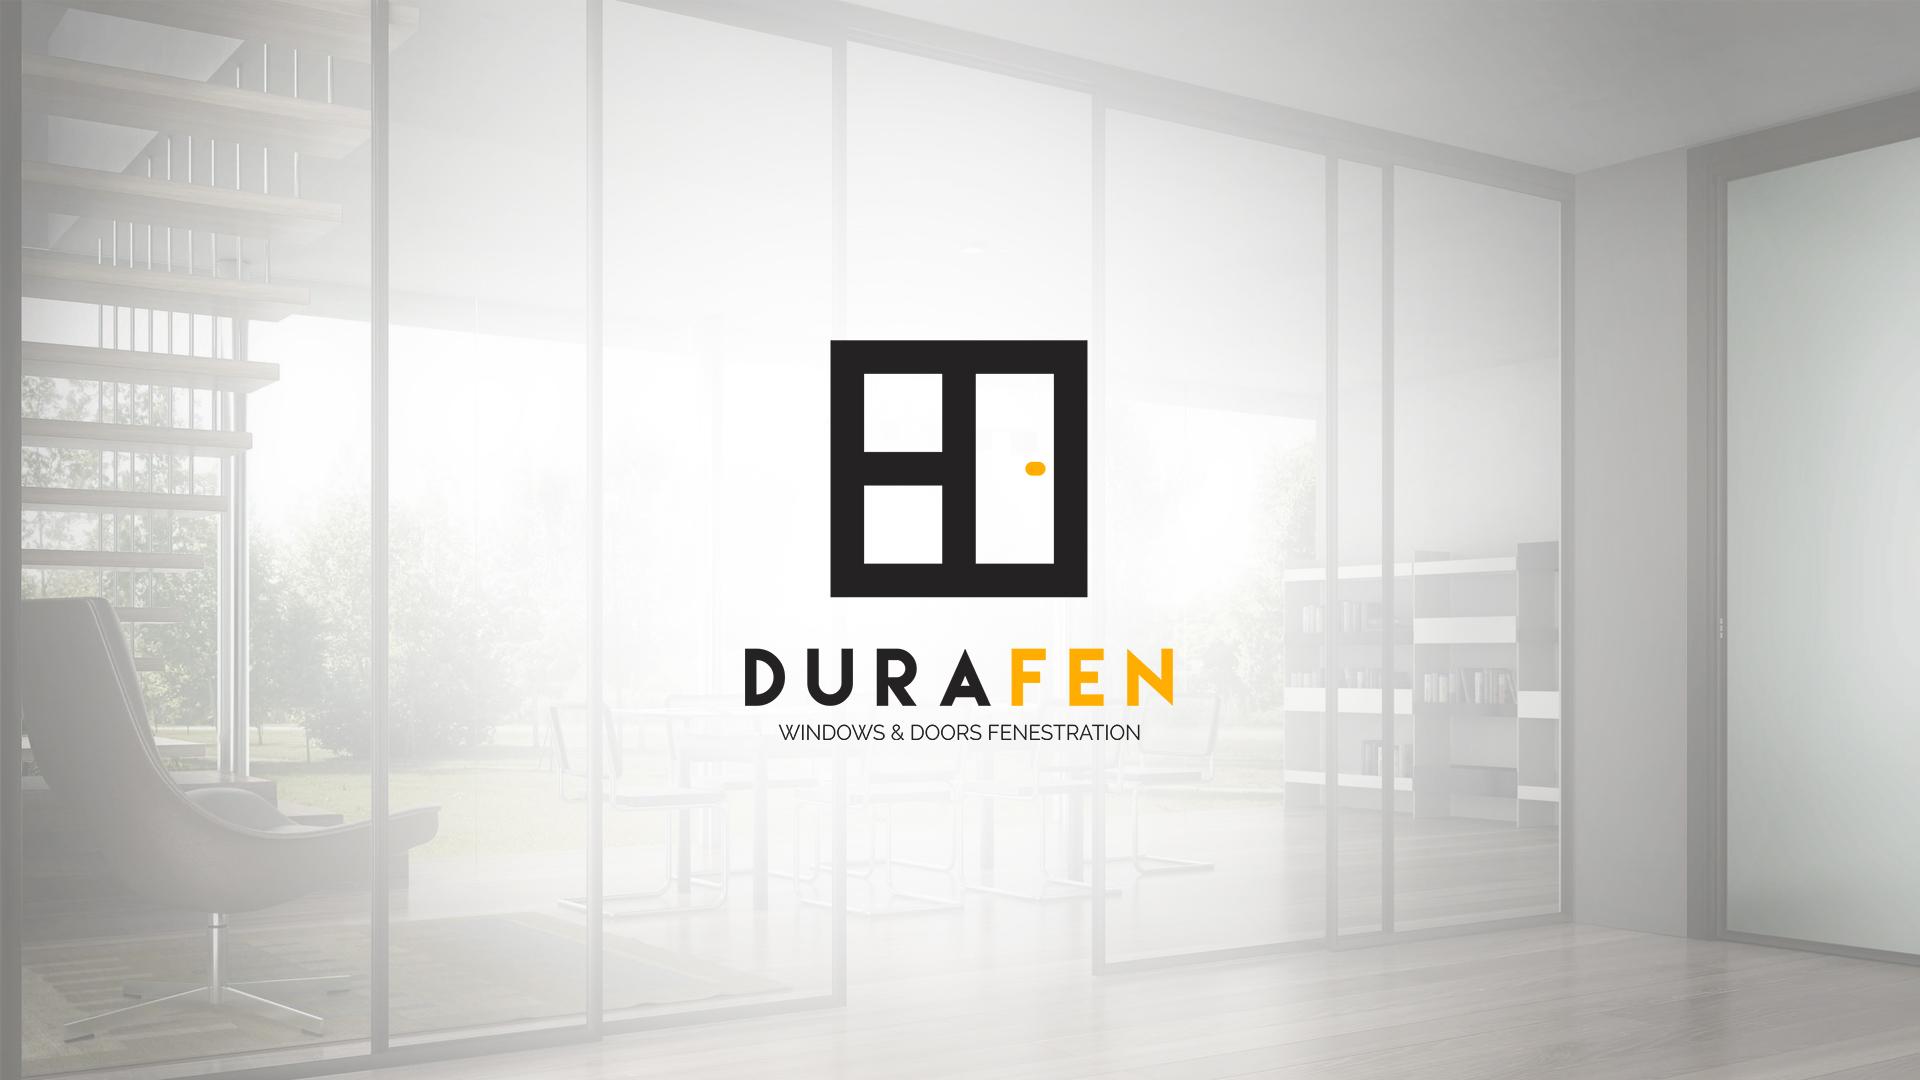 'DuraFen' Logo in 2020 Window company logos, Logo design